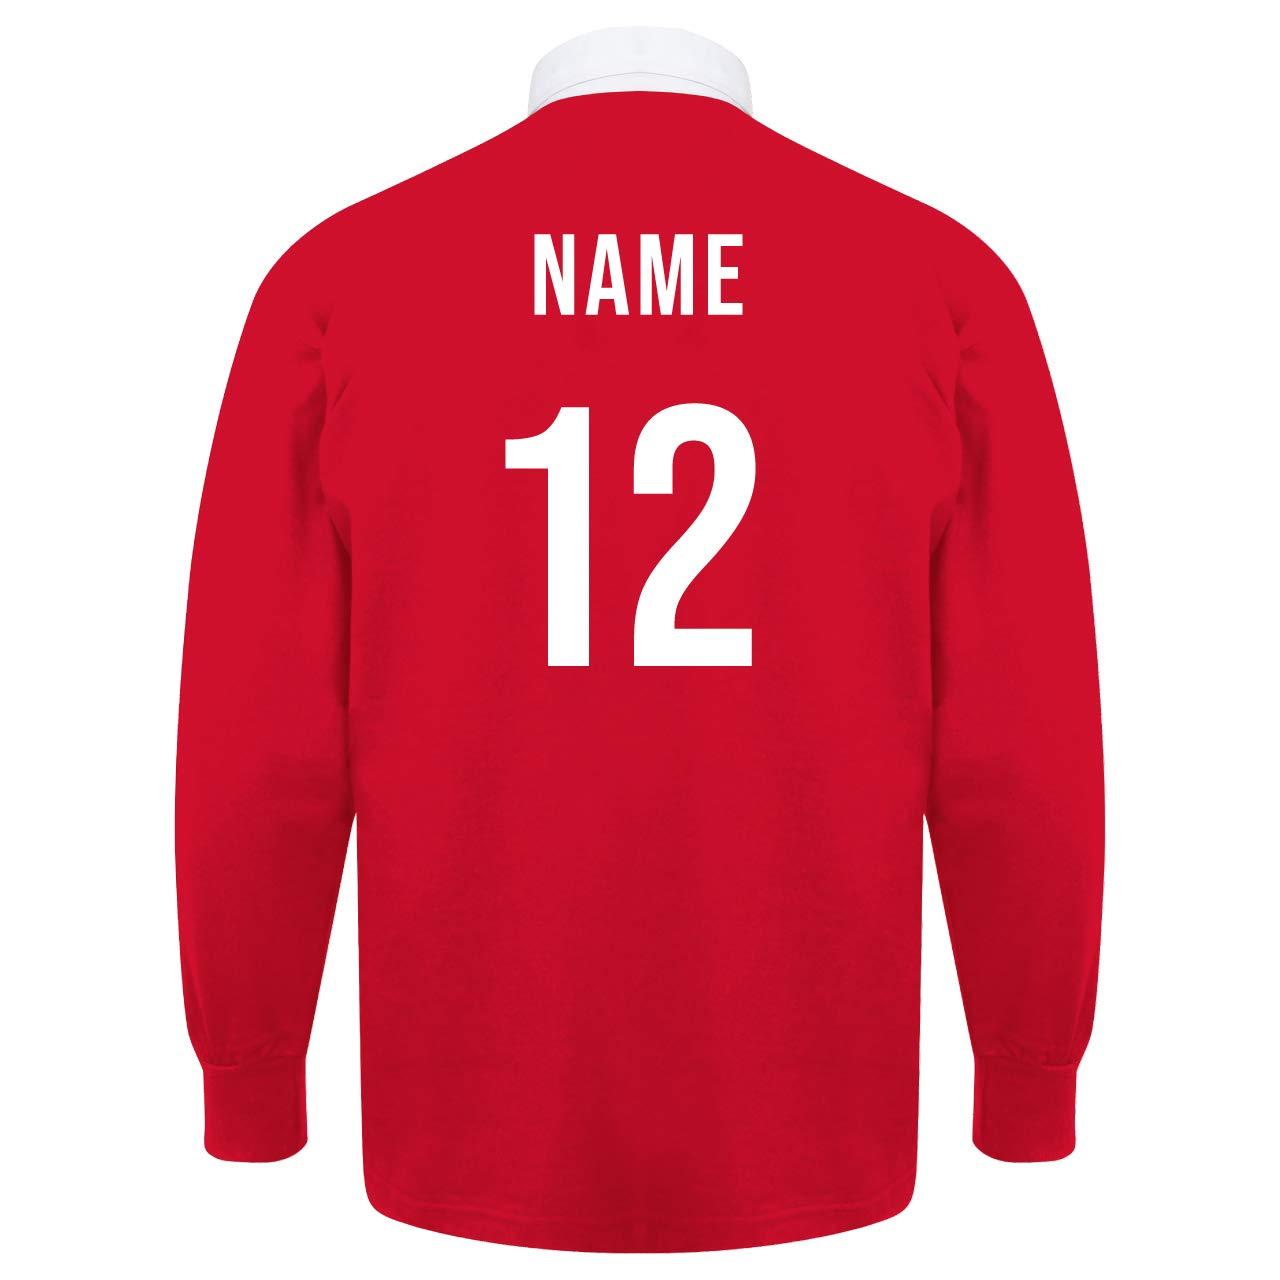 b74b1d959020 Printmeashirt Men s Classic Wales Cymru Crest Long Sleeve Rugby Shirt   Amazon.co.uk  Clothing